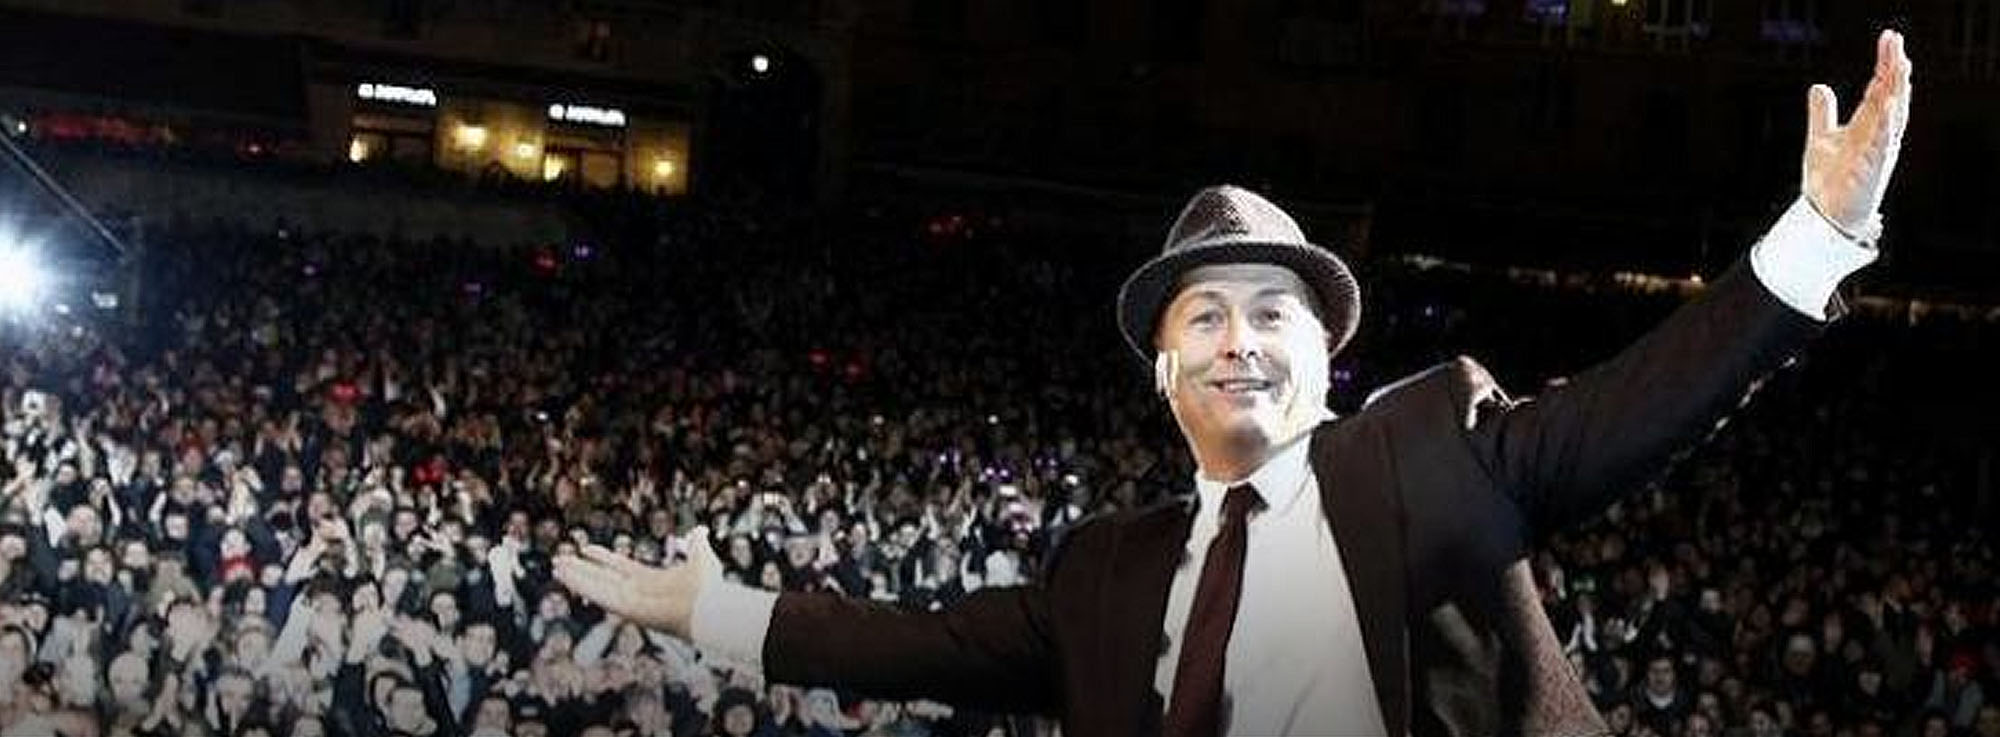 Minervino Murge: 30 anni di successi...in tour